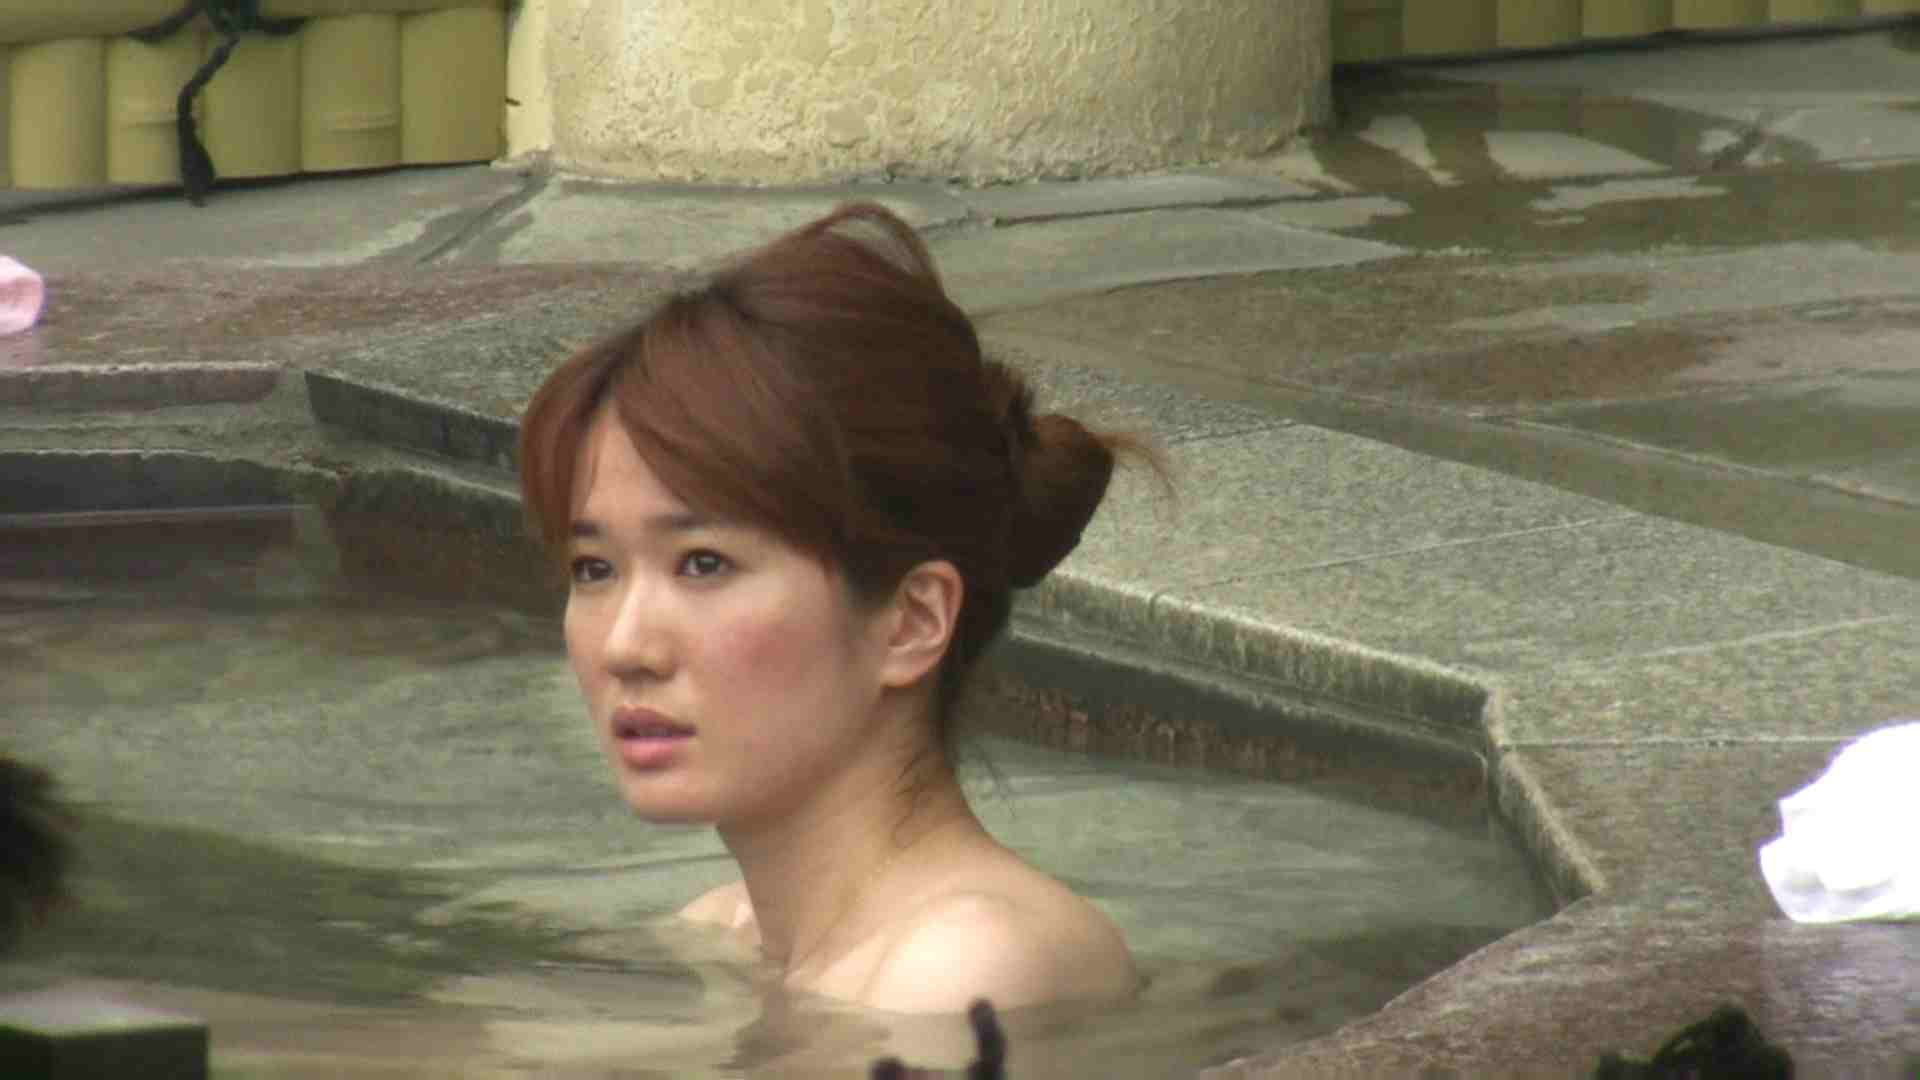 Aquaな露天風呂Vol.110 盗撮映像  46Pix 18